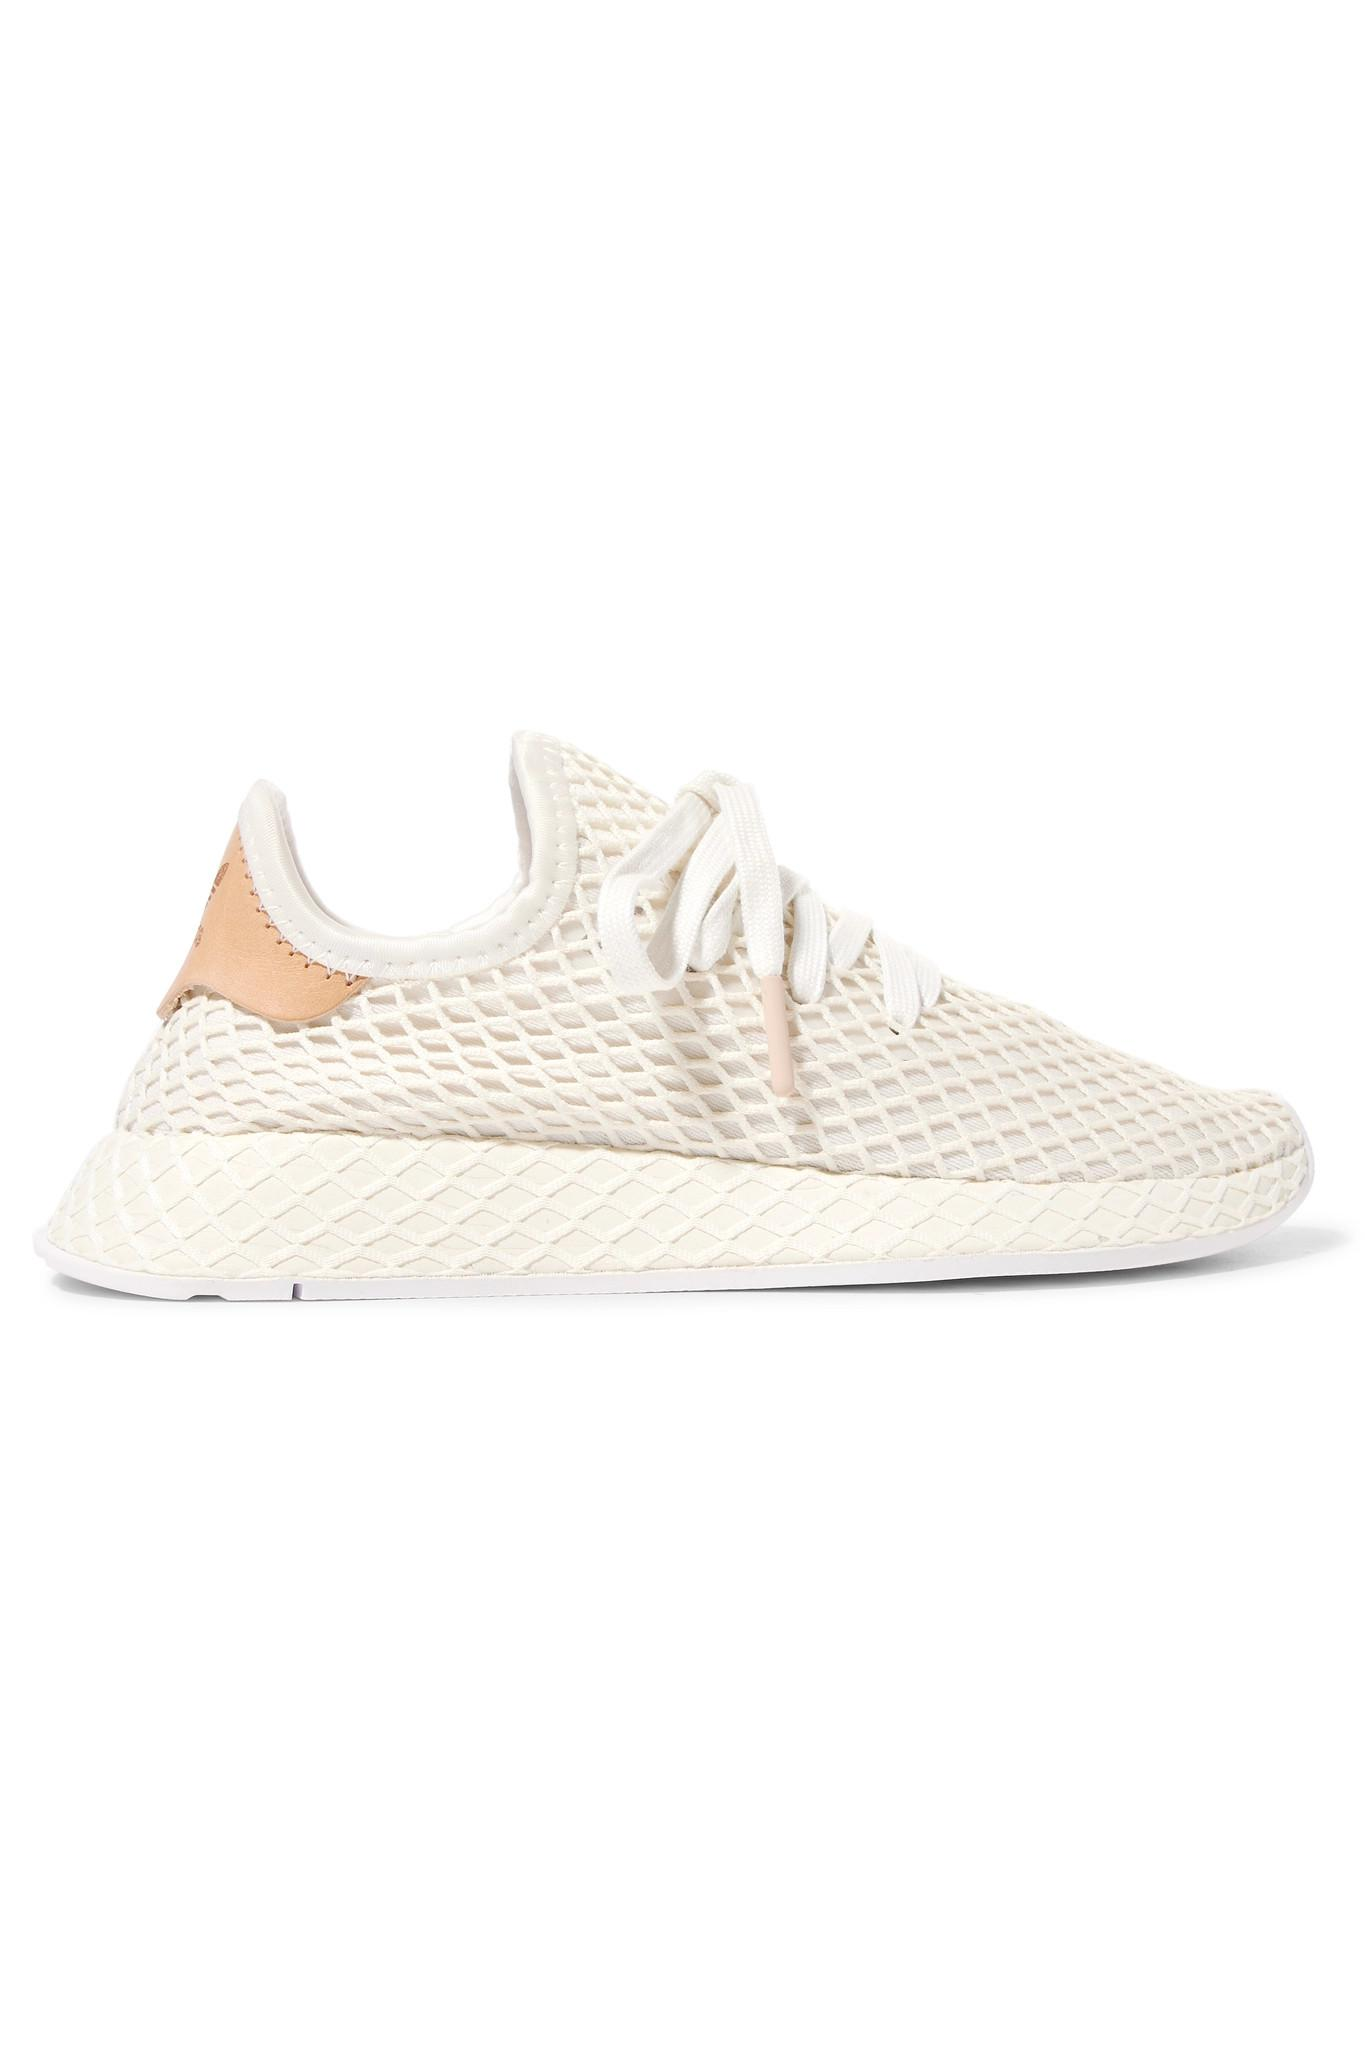 7300458a1930c adidas Originals. Women s White Deerupt Runner Leather-trimmed Mesh Sneakers